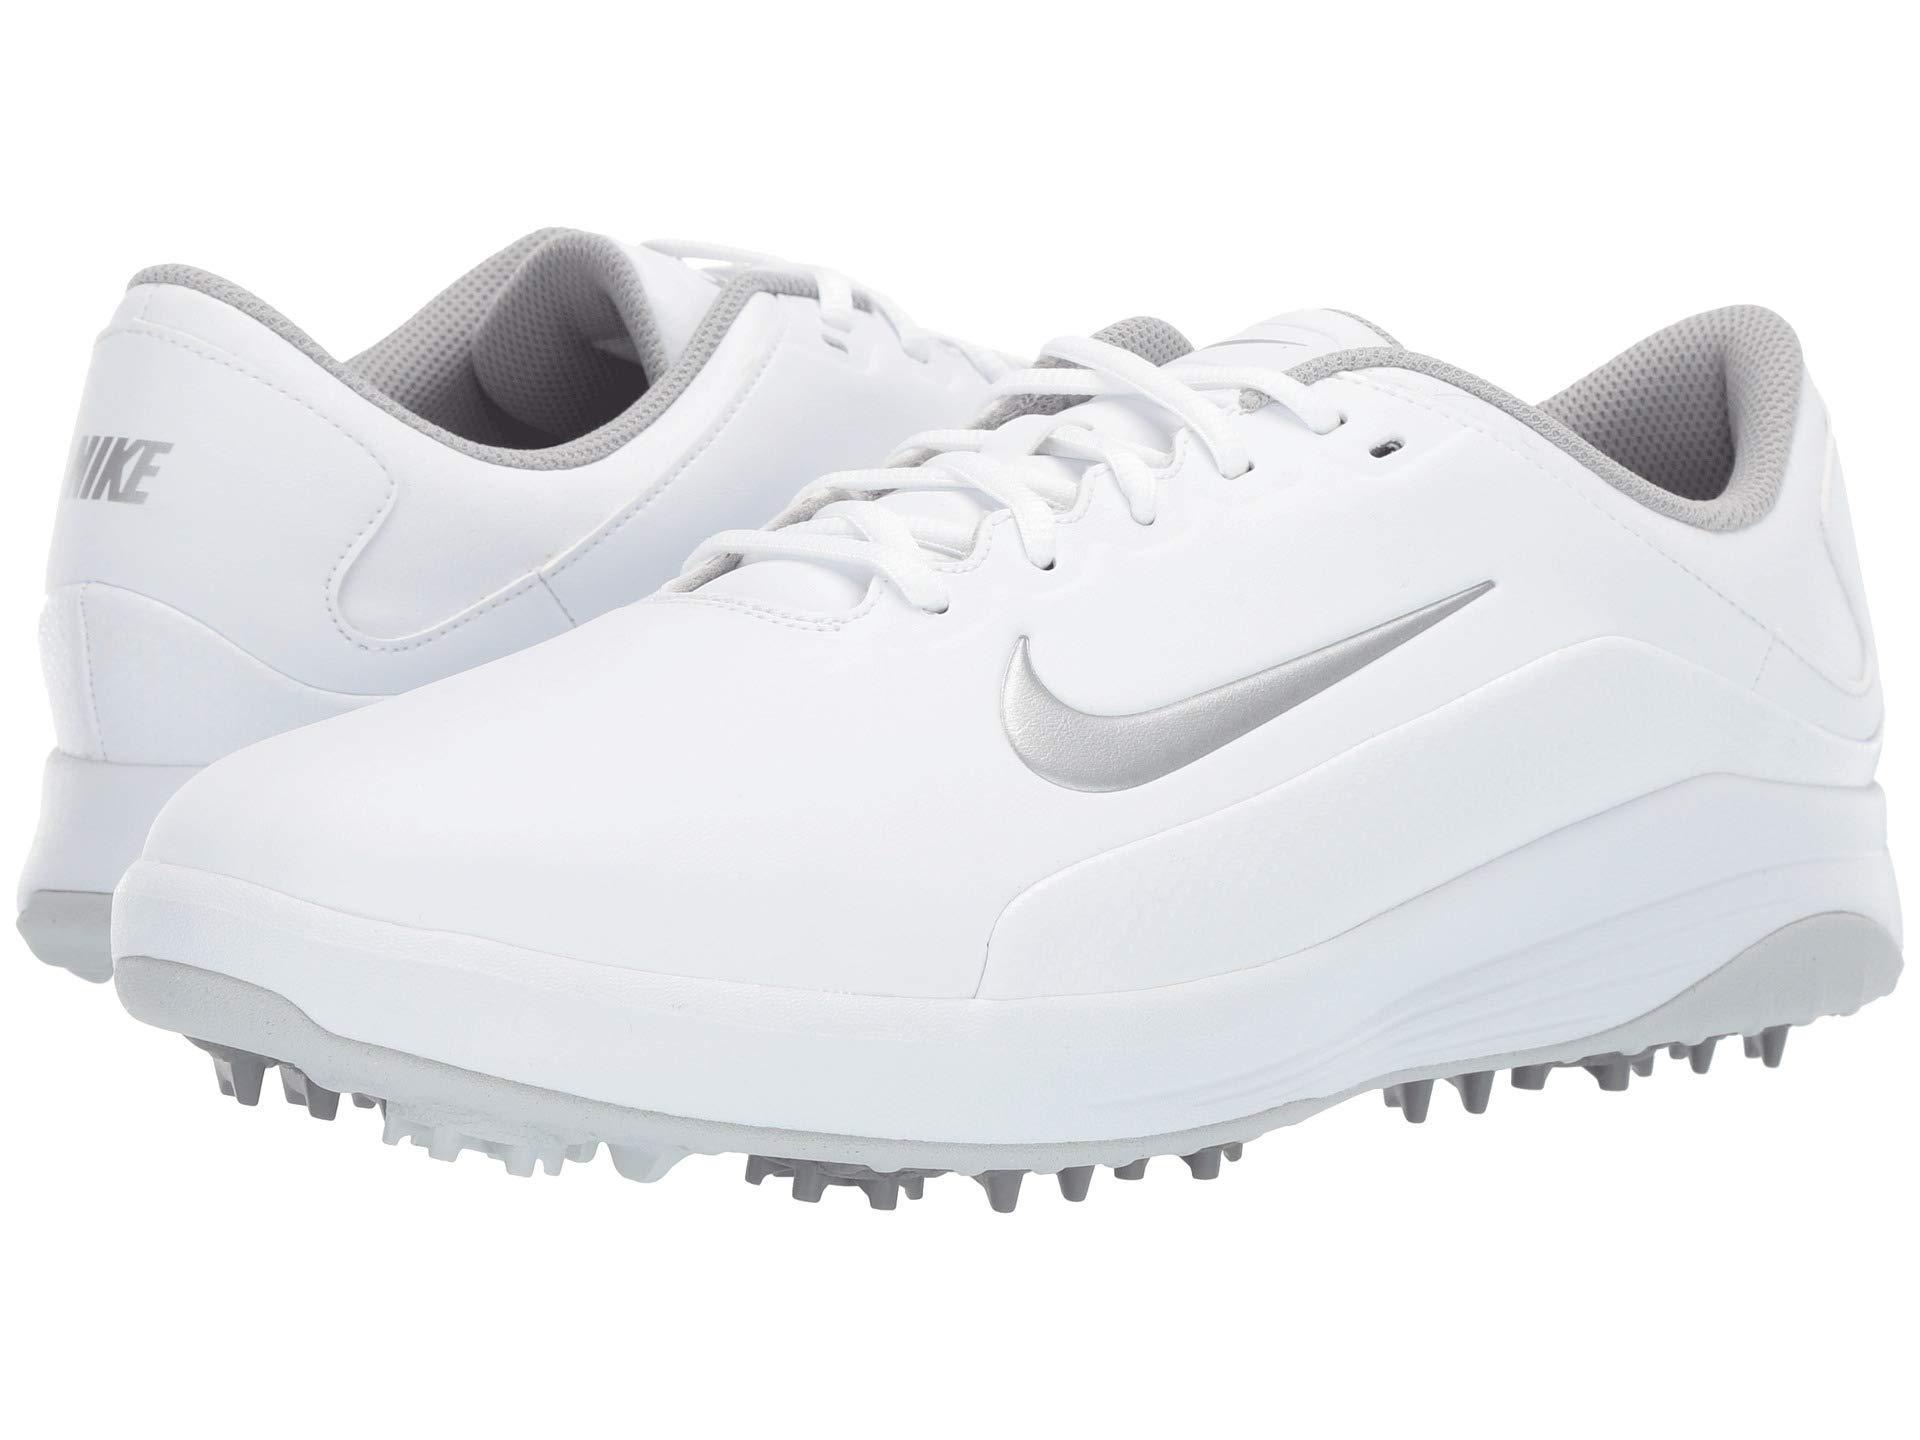 9c8e604f617 Lyst - Nike Vapor (white metallic Silver pure Platinum) Men s Golf ...